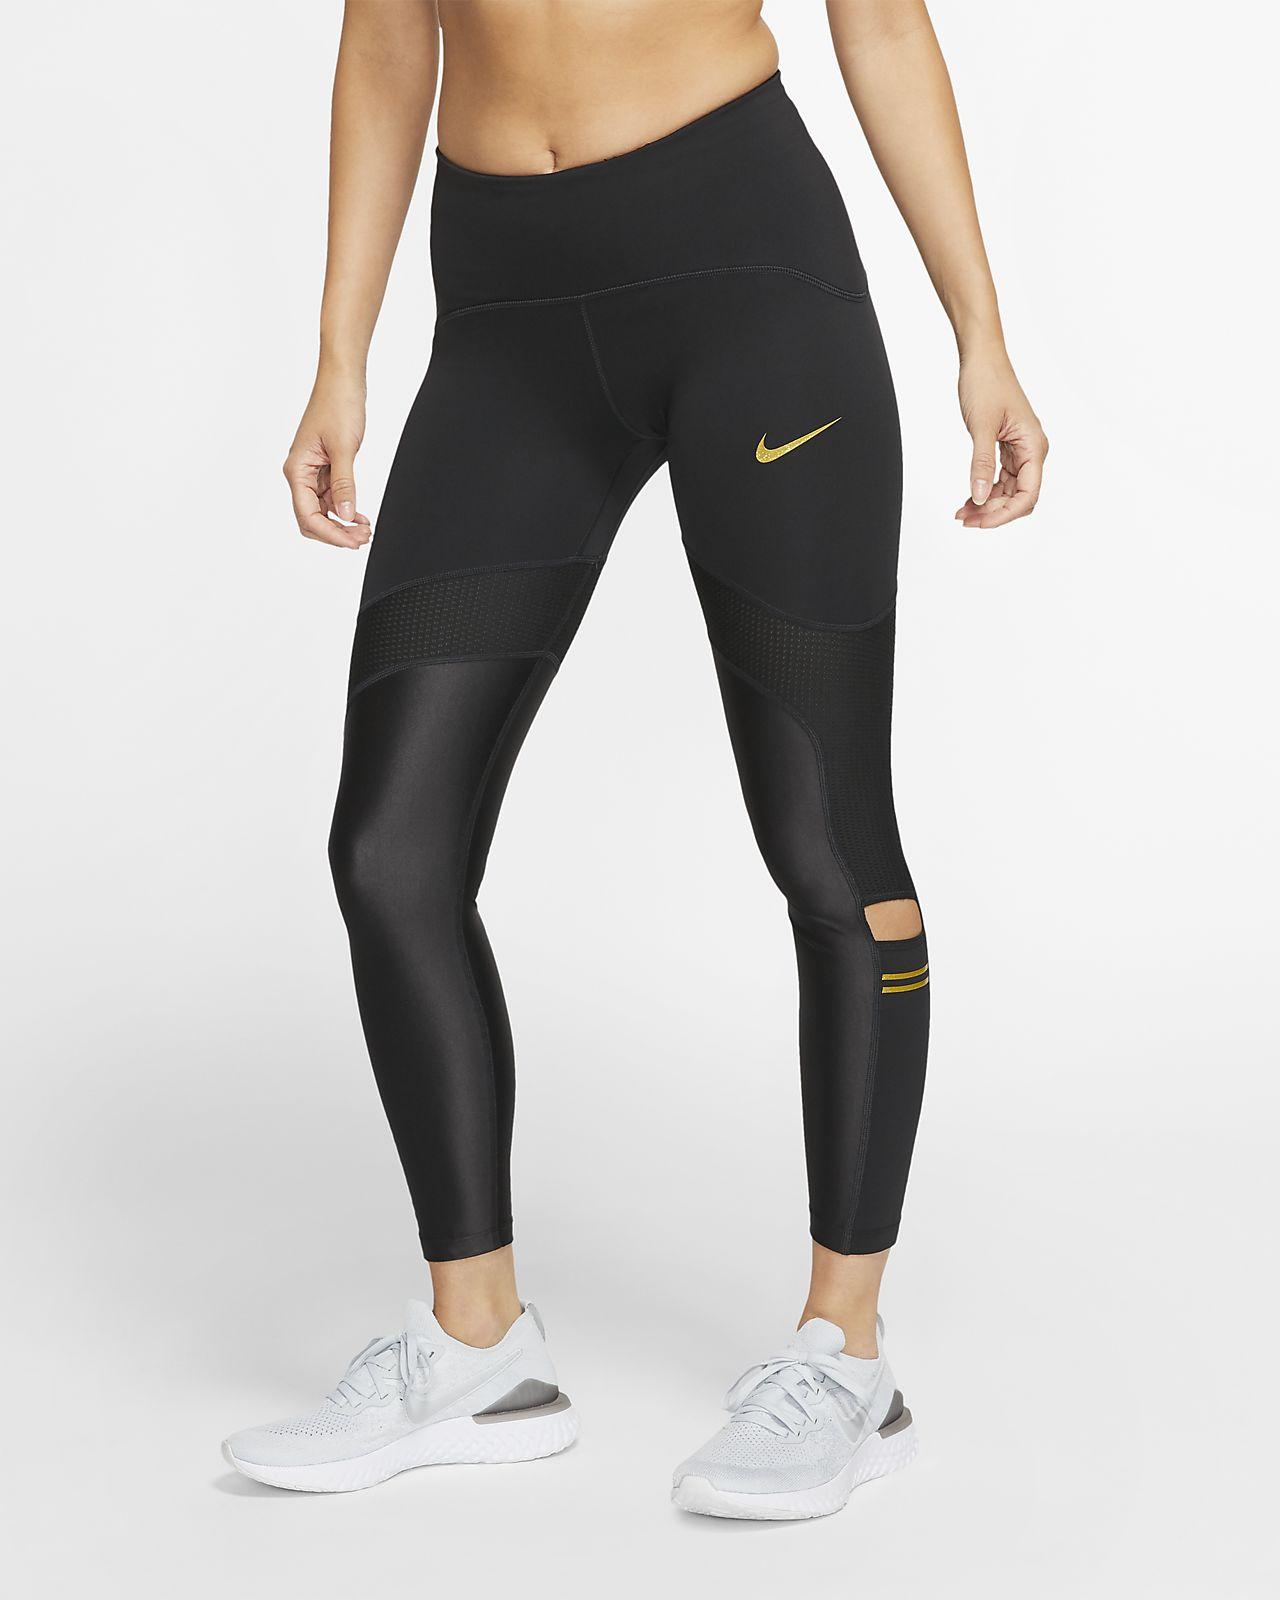 Tights de running a 7/8 Nike Speed para mulher